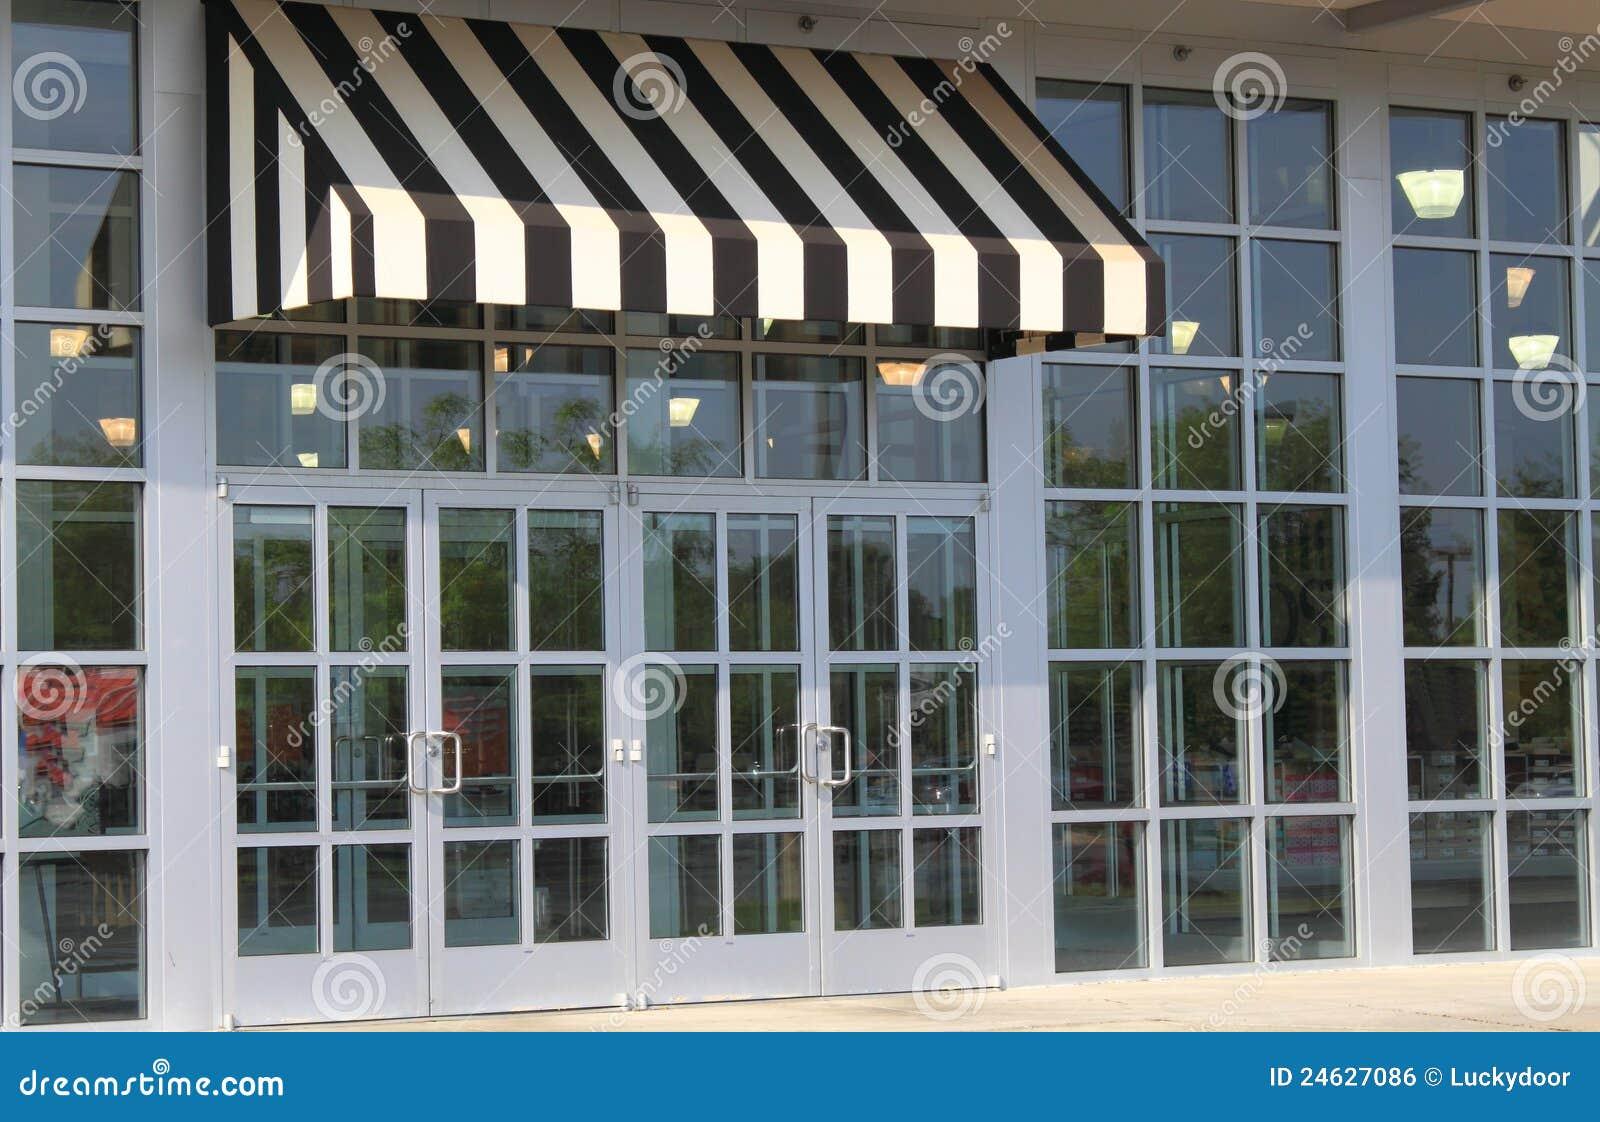 Black And White Awning Stock Photo Image Of Doors Awnings 24627086